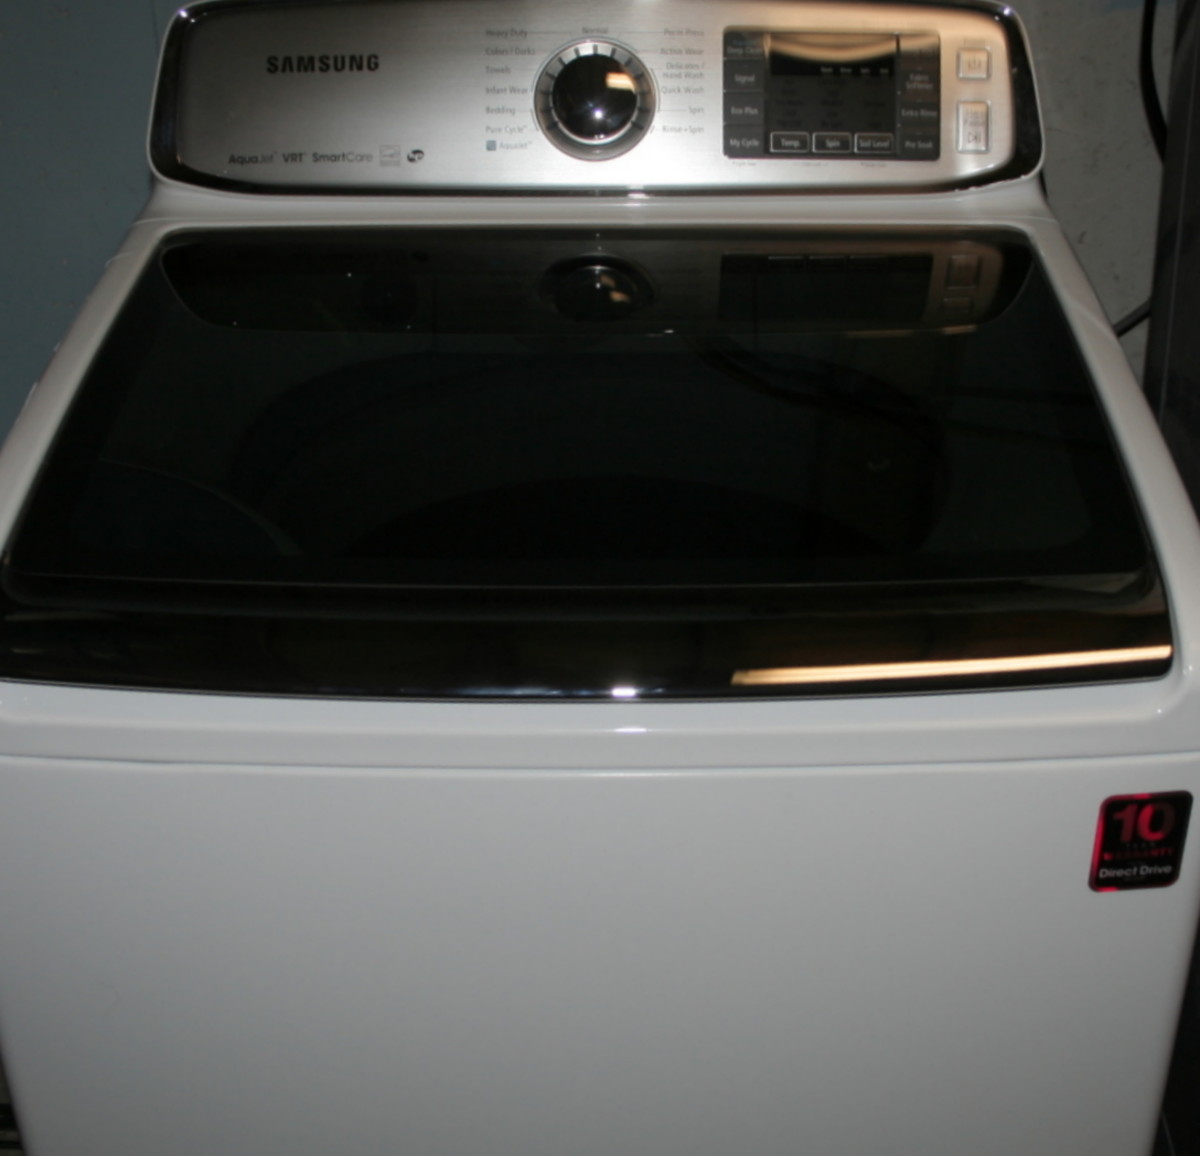 samsung-top-loader-washing-machine